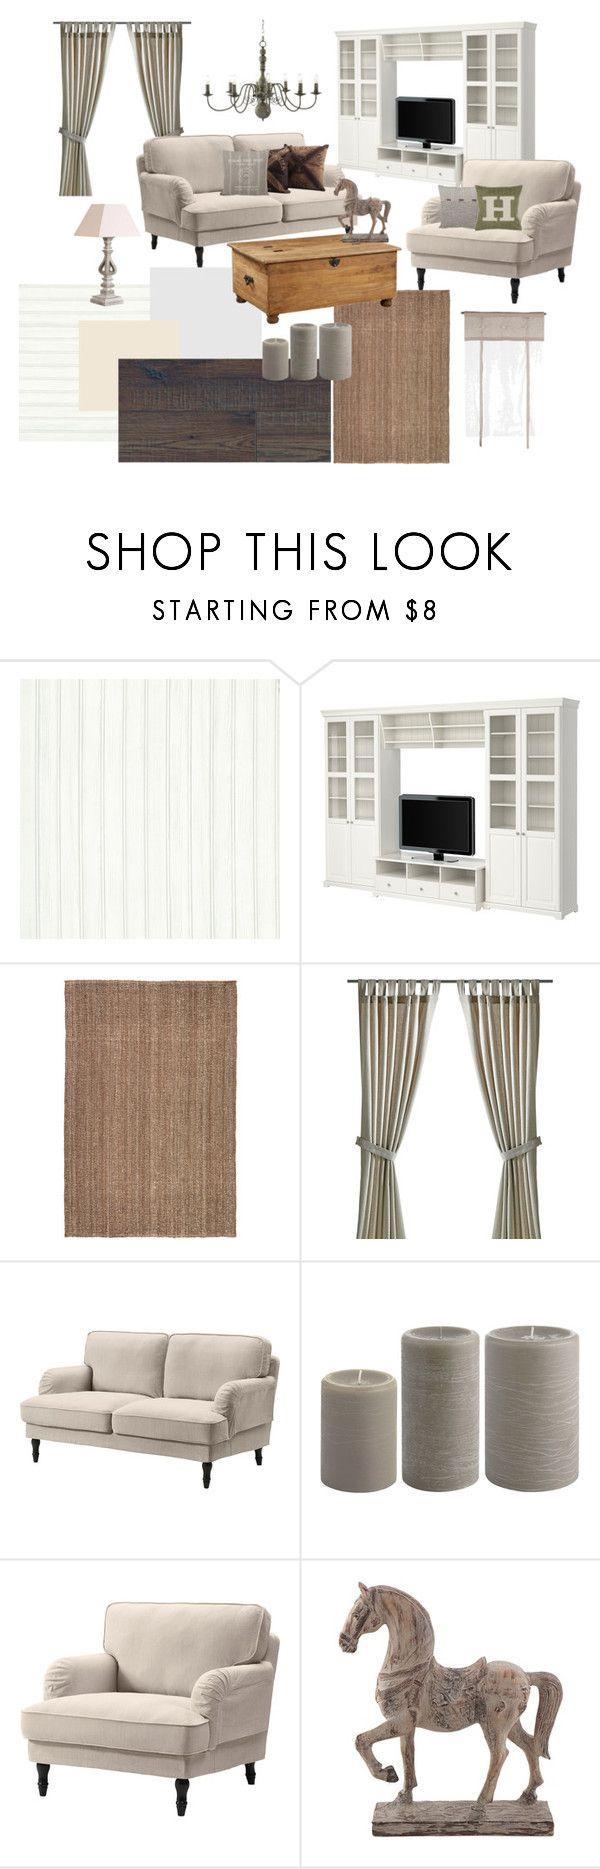 Rusztikus nappali by zs-salamon on Polyvore featuring interior, interiors, interior design, home, home decor, interior decorating and Universal Lighting and Decor